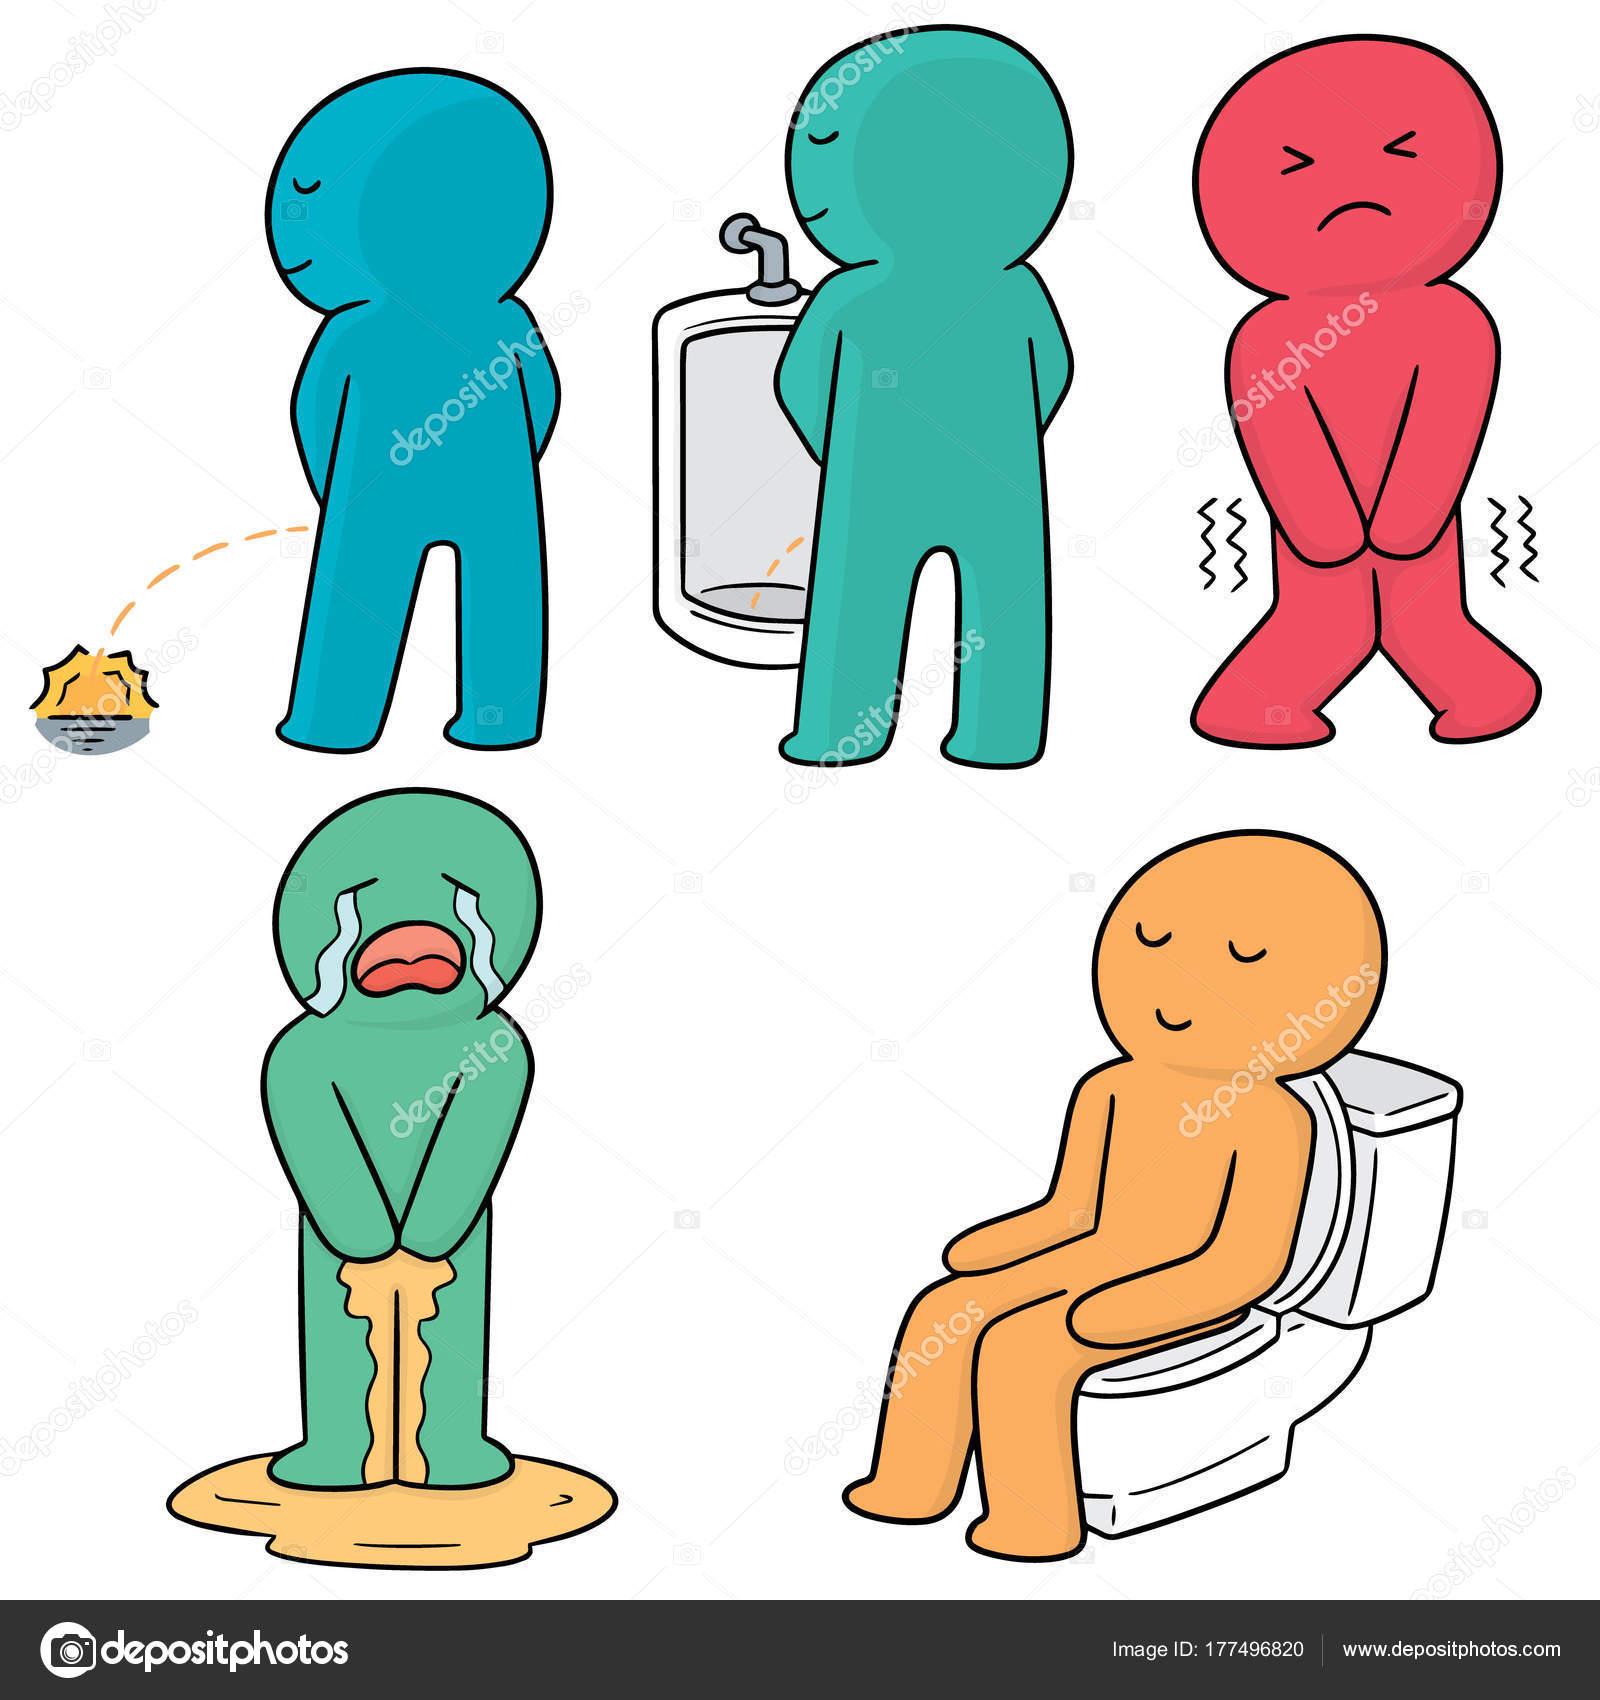 Clip art man peeing